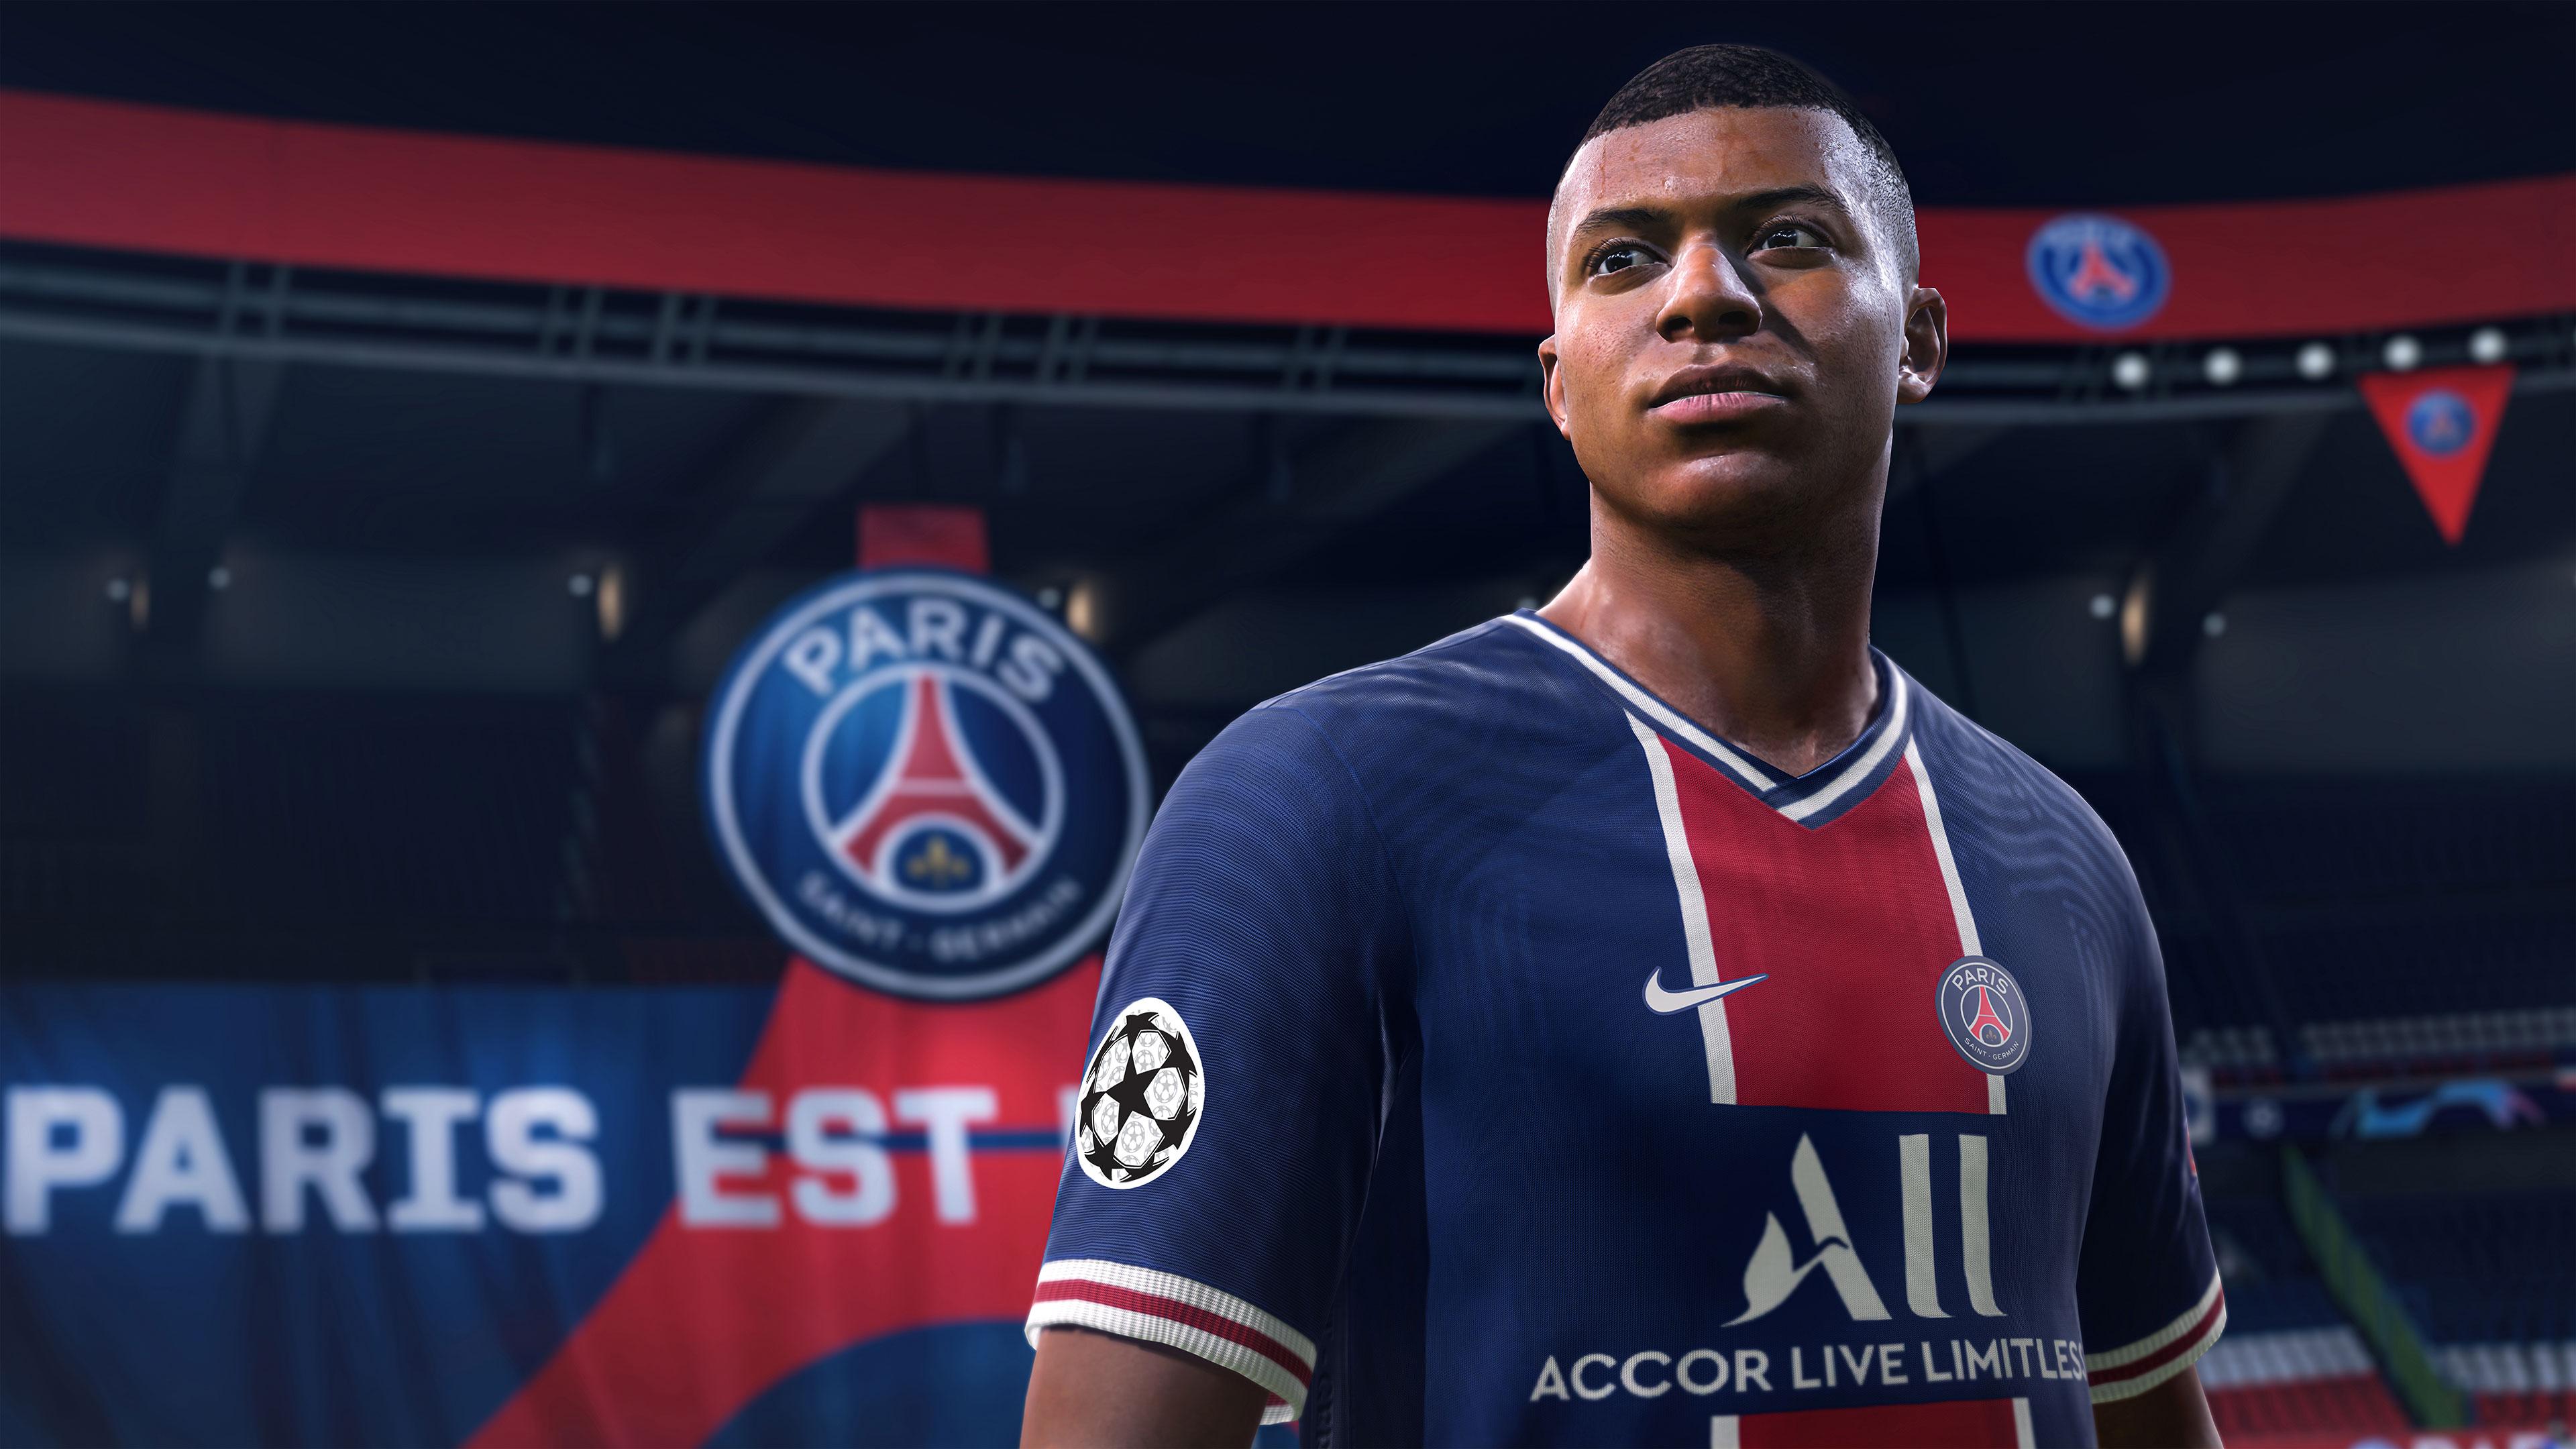 Скриншот №6 к FIFA 21 издание Champions PS4 and PS5